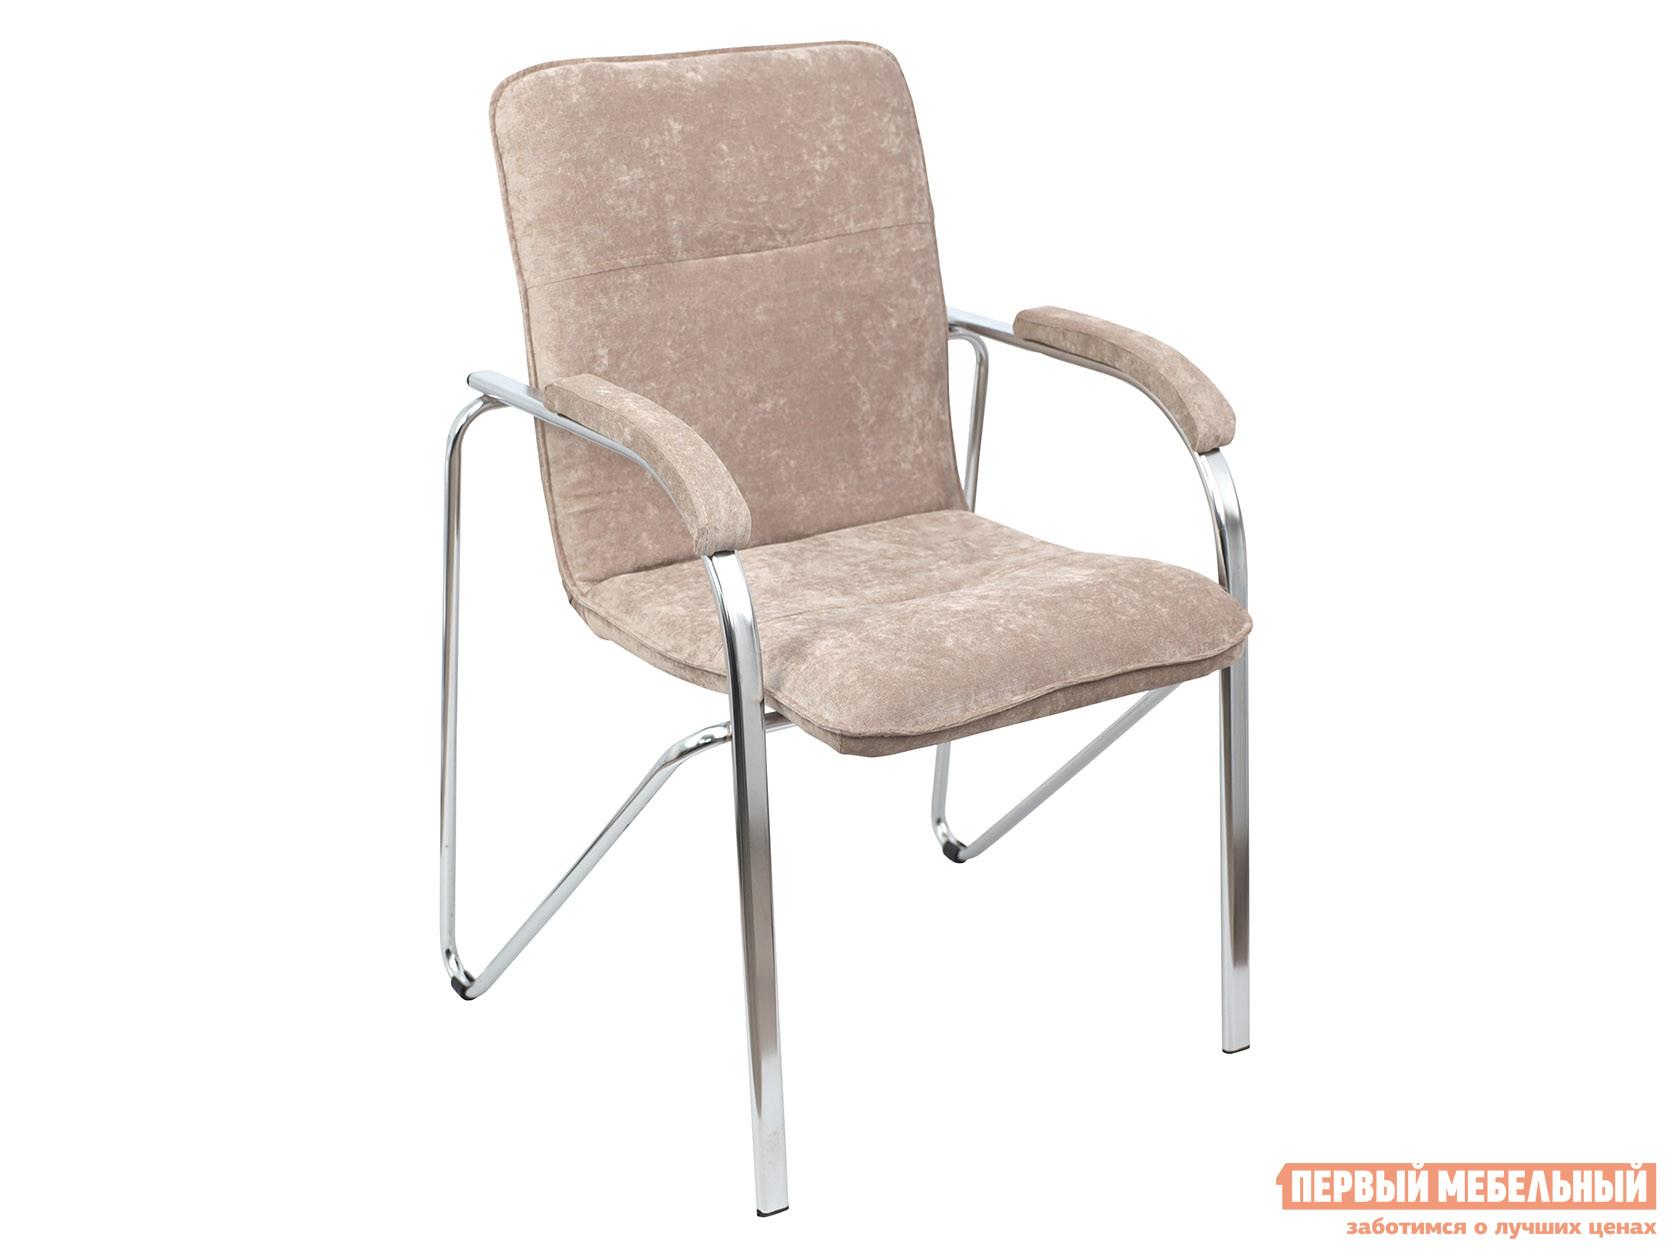 Офисный стул  SAMBA AKS-1 Бежевый, велюр, Мягкие Базистрейд 137647